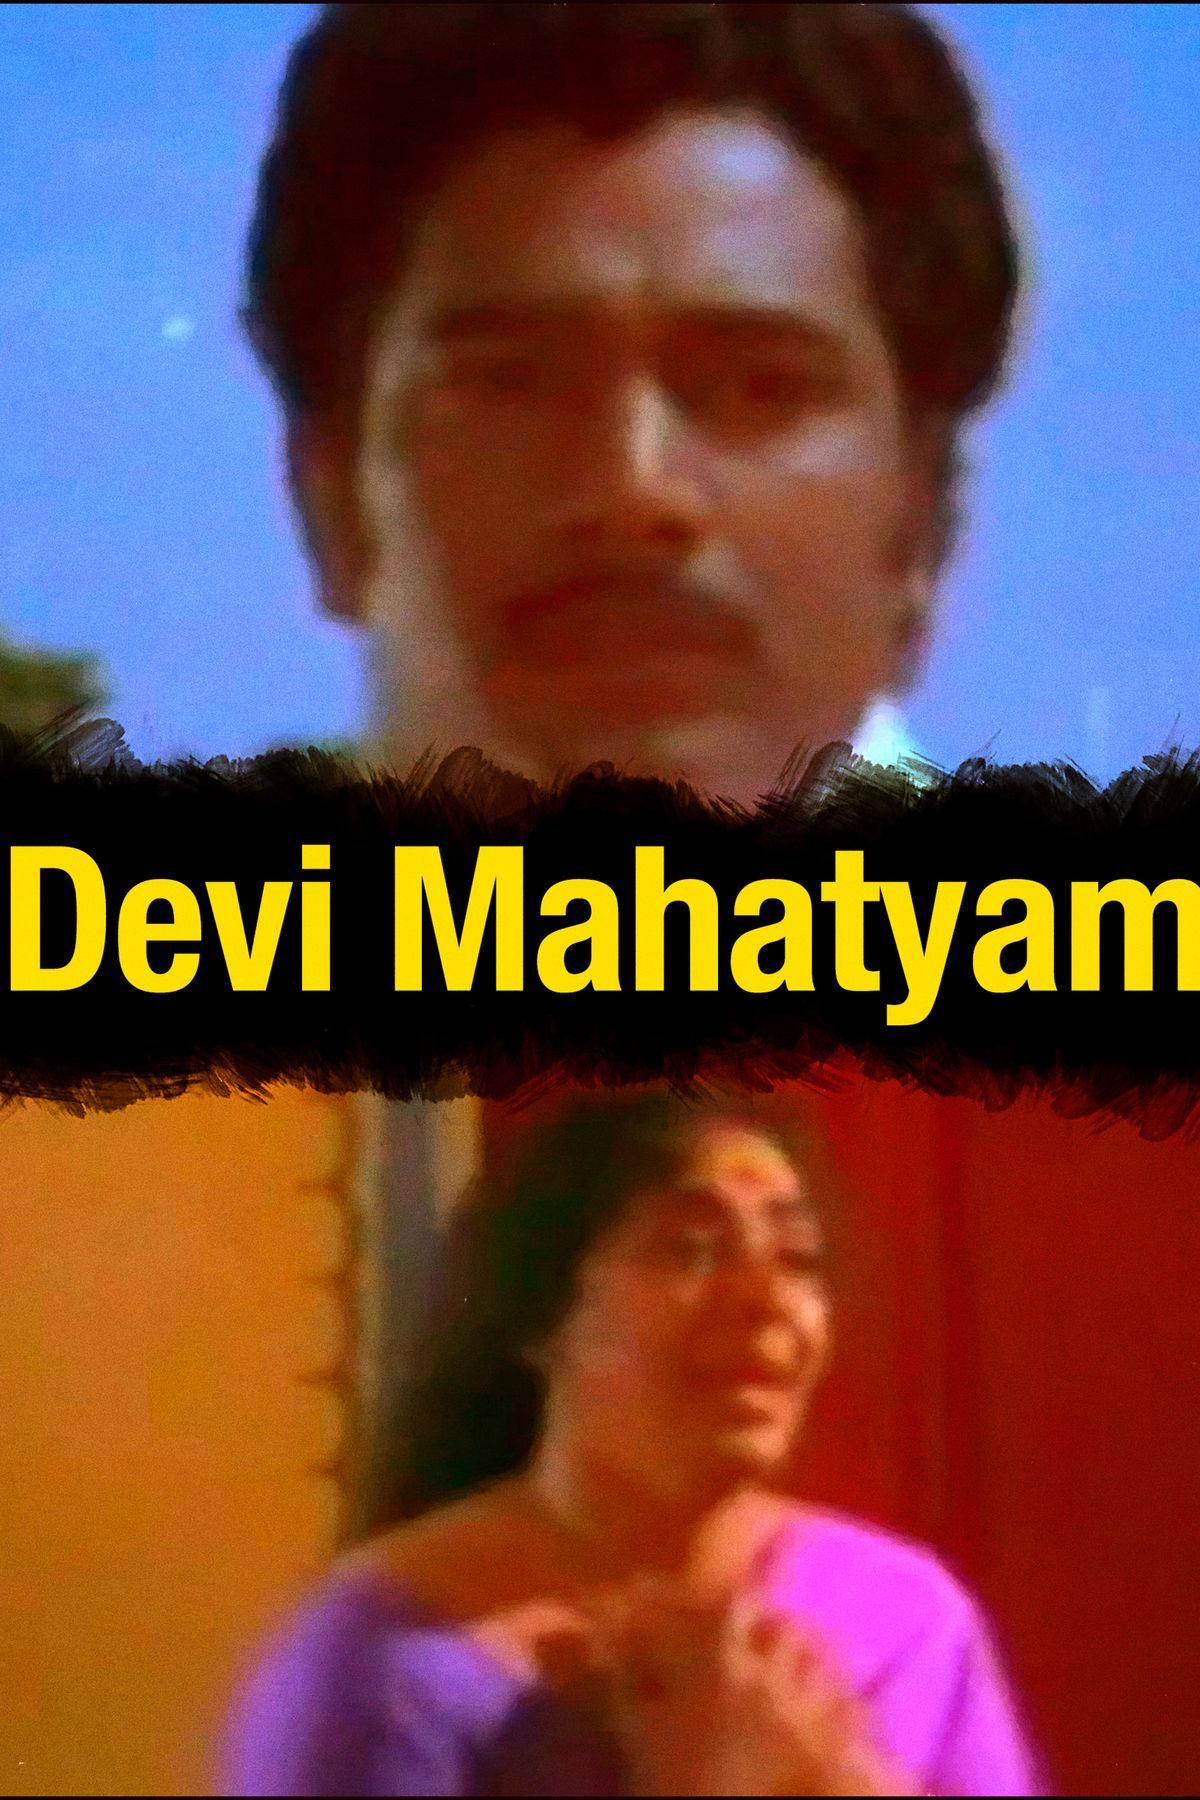 Devi Mahatyam